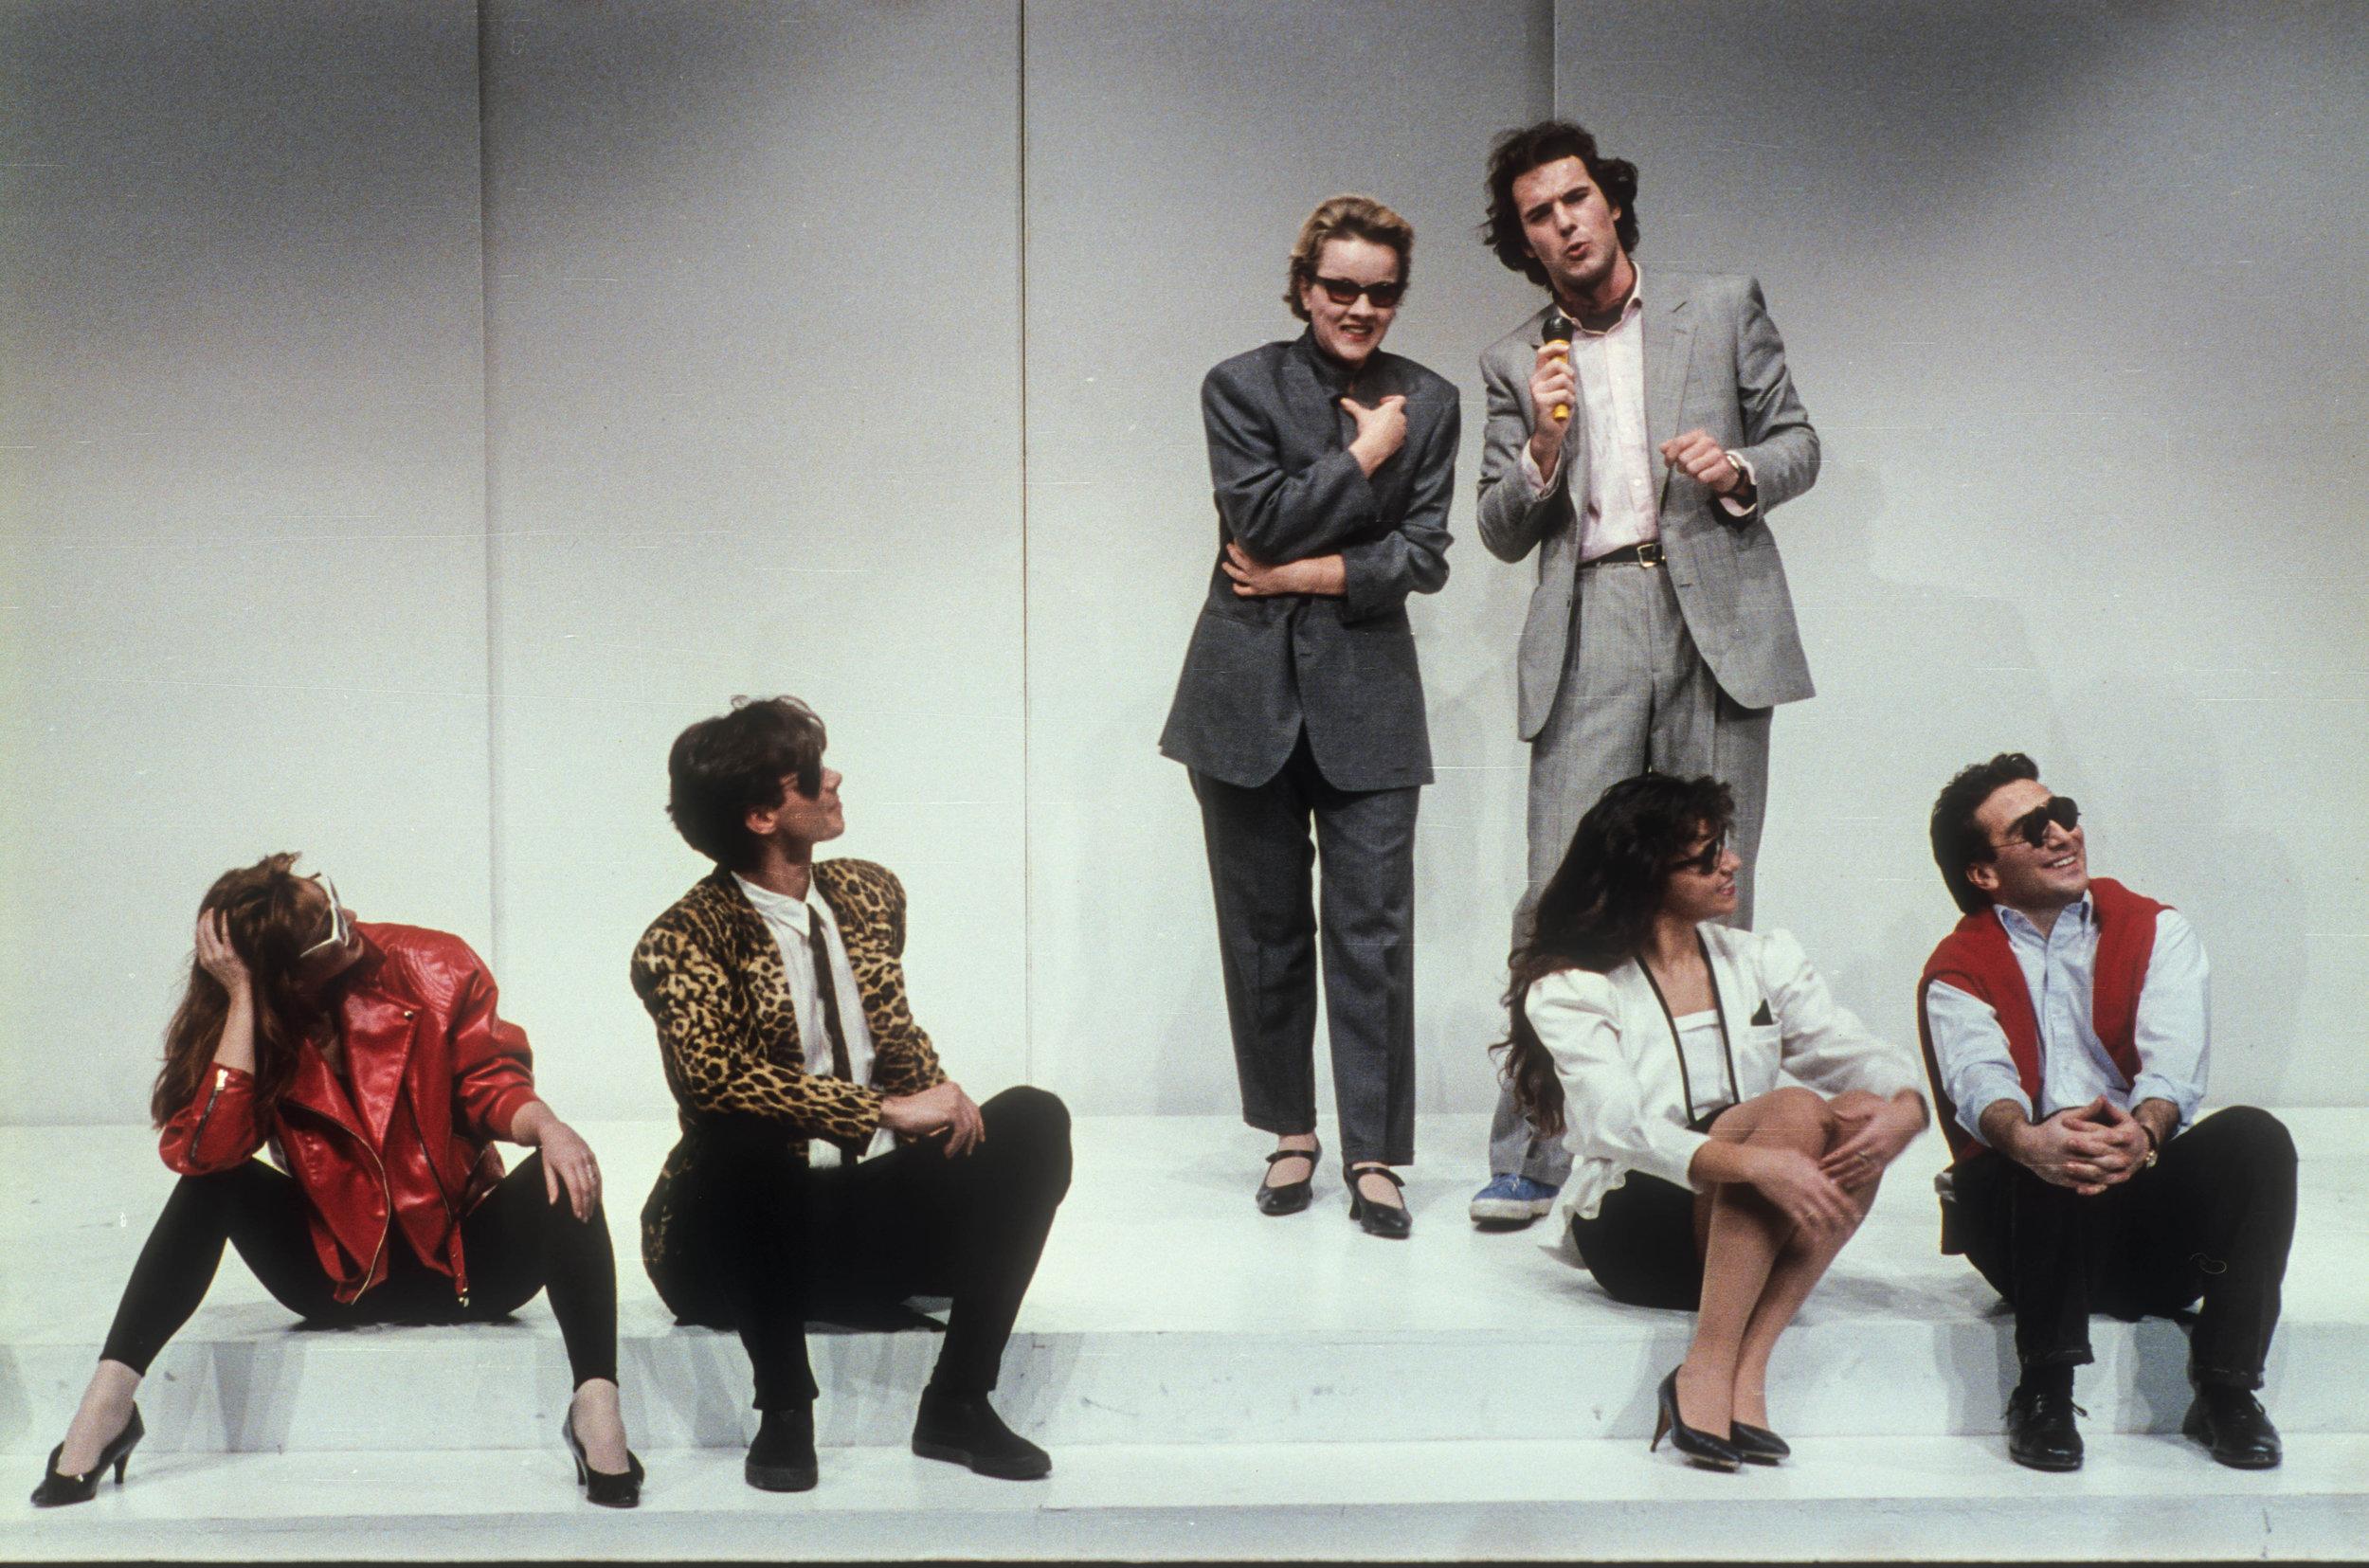 Kessy Canta - P. Eliseo1989 - da sinistra: Mirta Pepe, Daniele Giarratanar, Lucilla Lupaioli, Marco Vallarino, Angela Mezzanotti e Bruno Maccallini